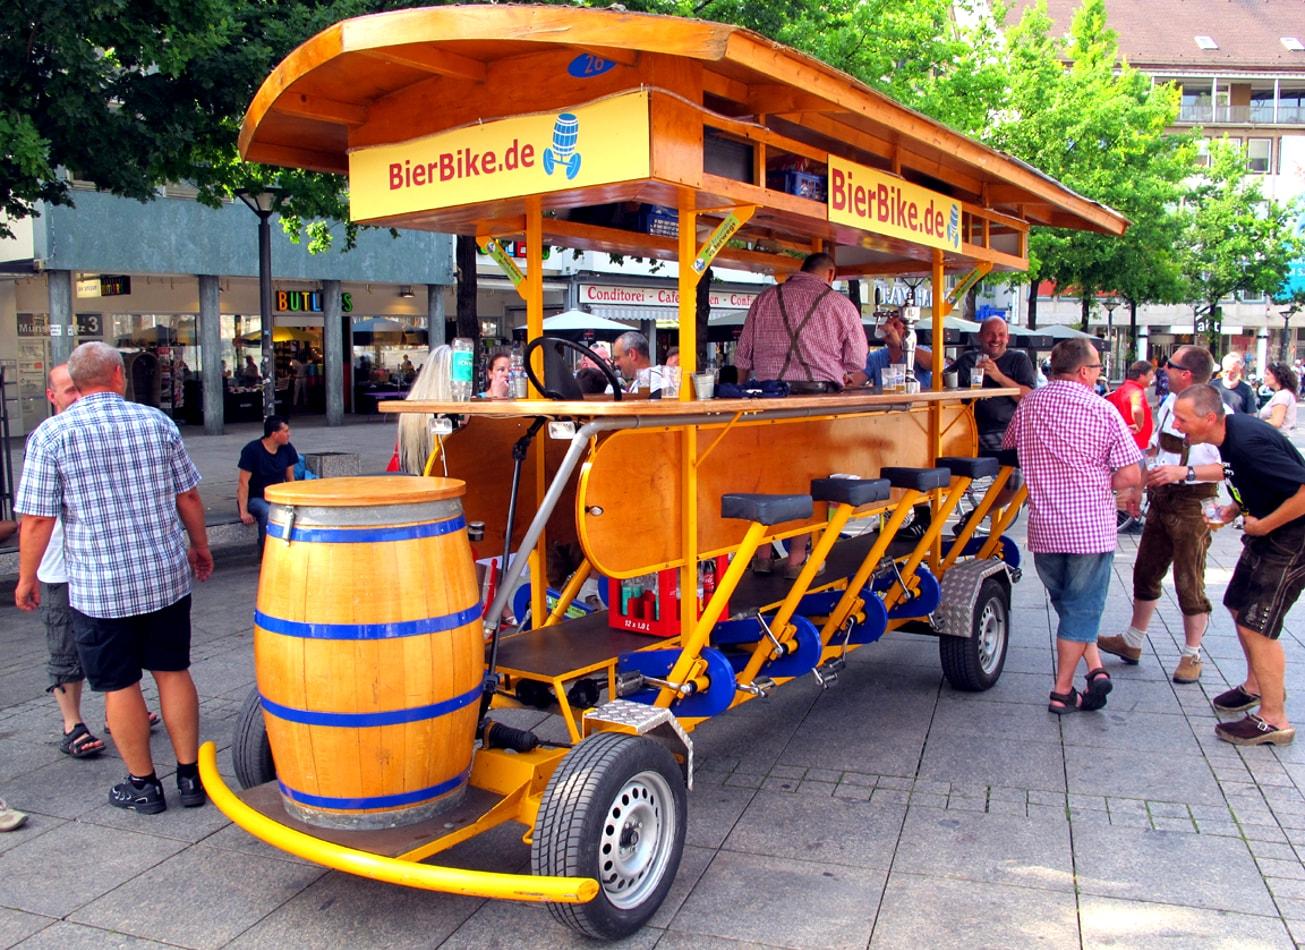 beer bike à berlin vélo bar bières activités berlin vimigo